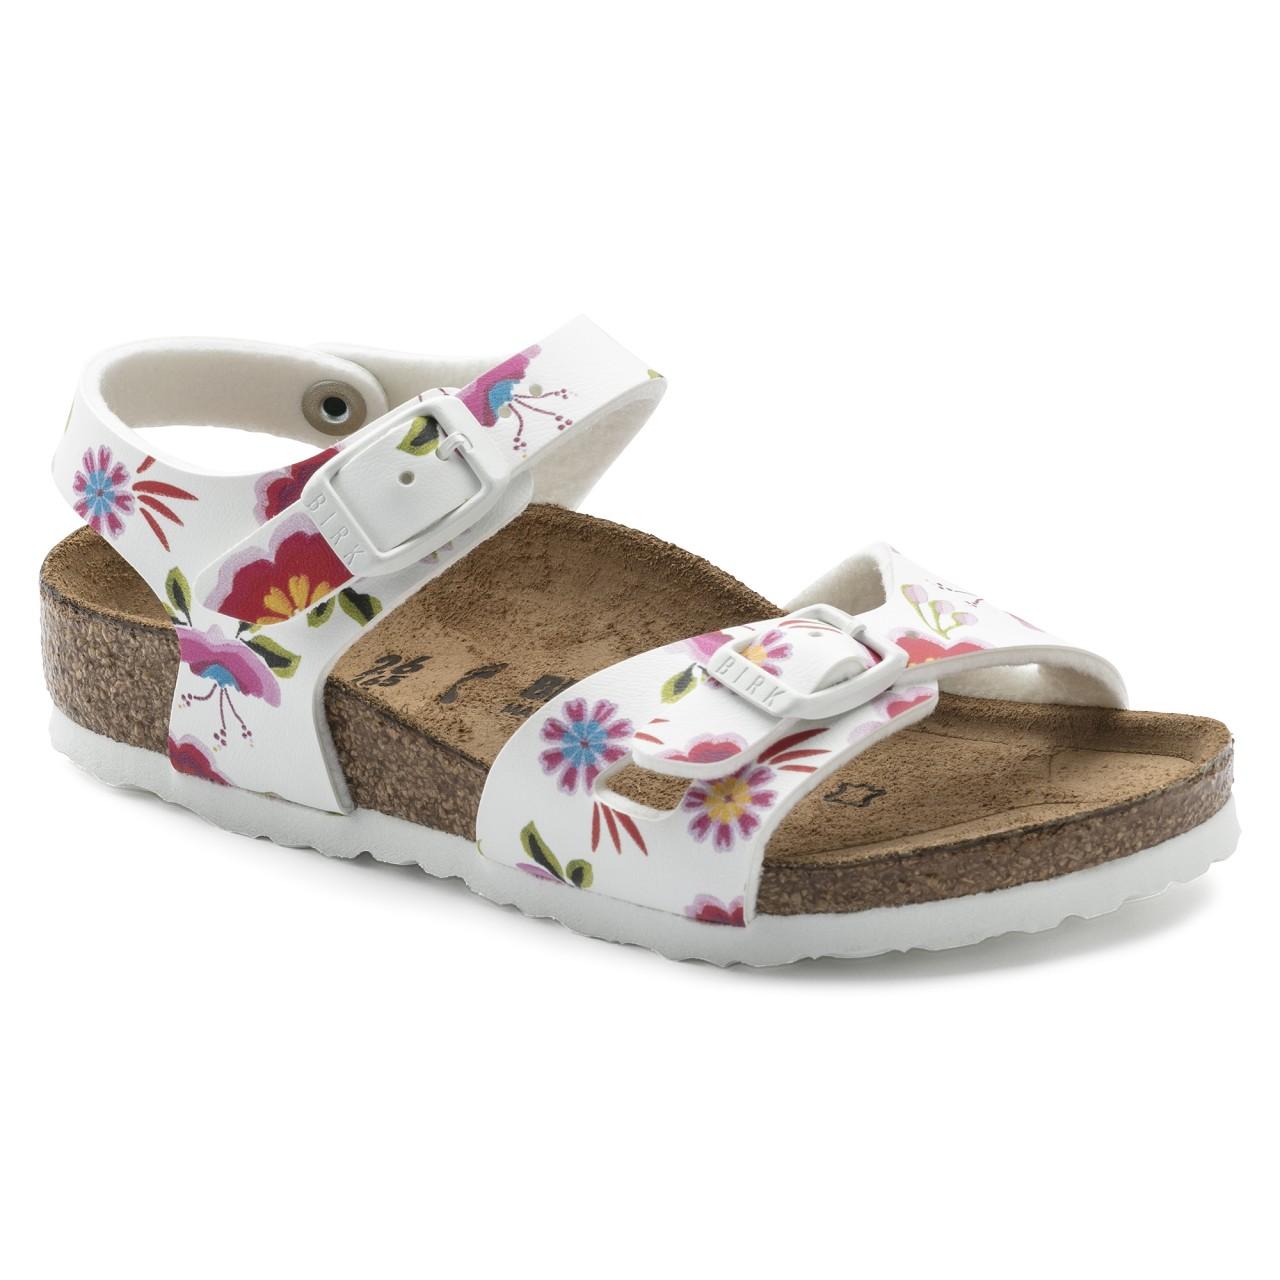 new product 1ac22 8db34 Birkenstock Bimba Rio Flowers 1008372